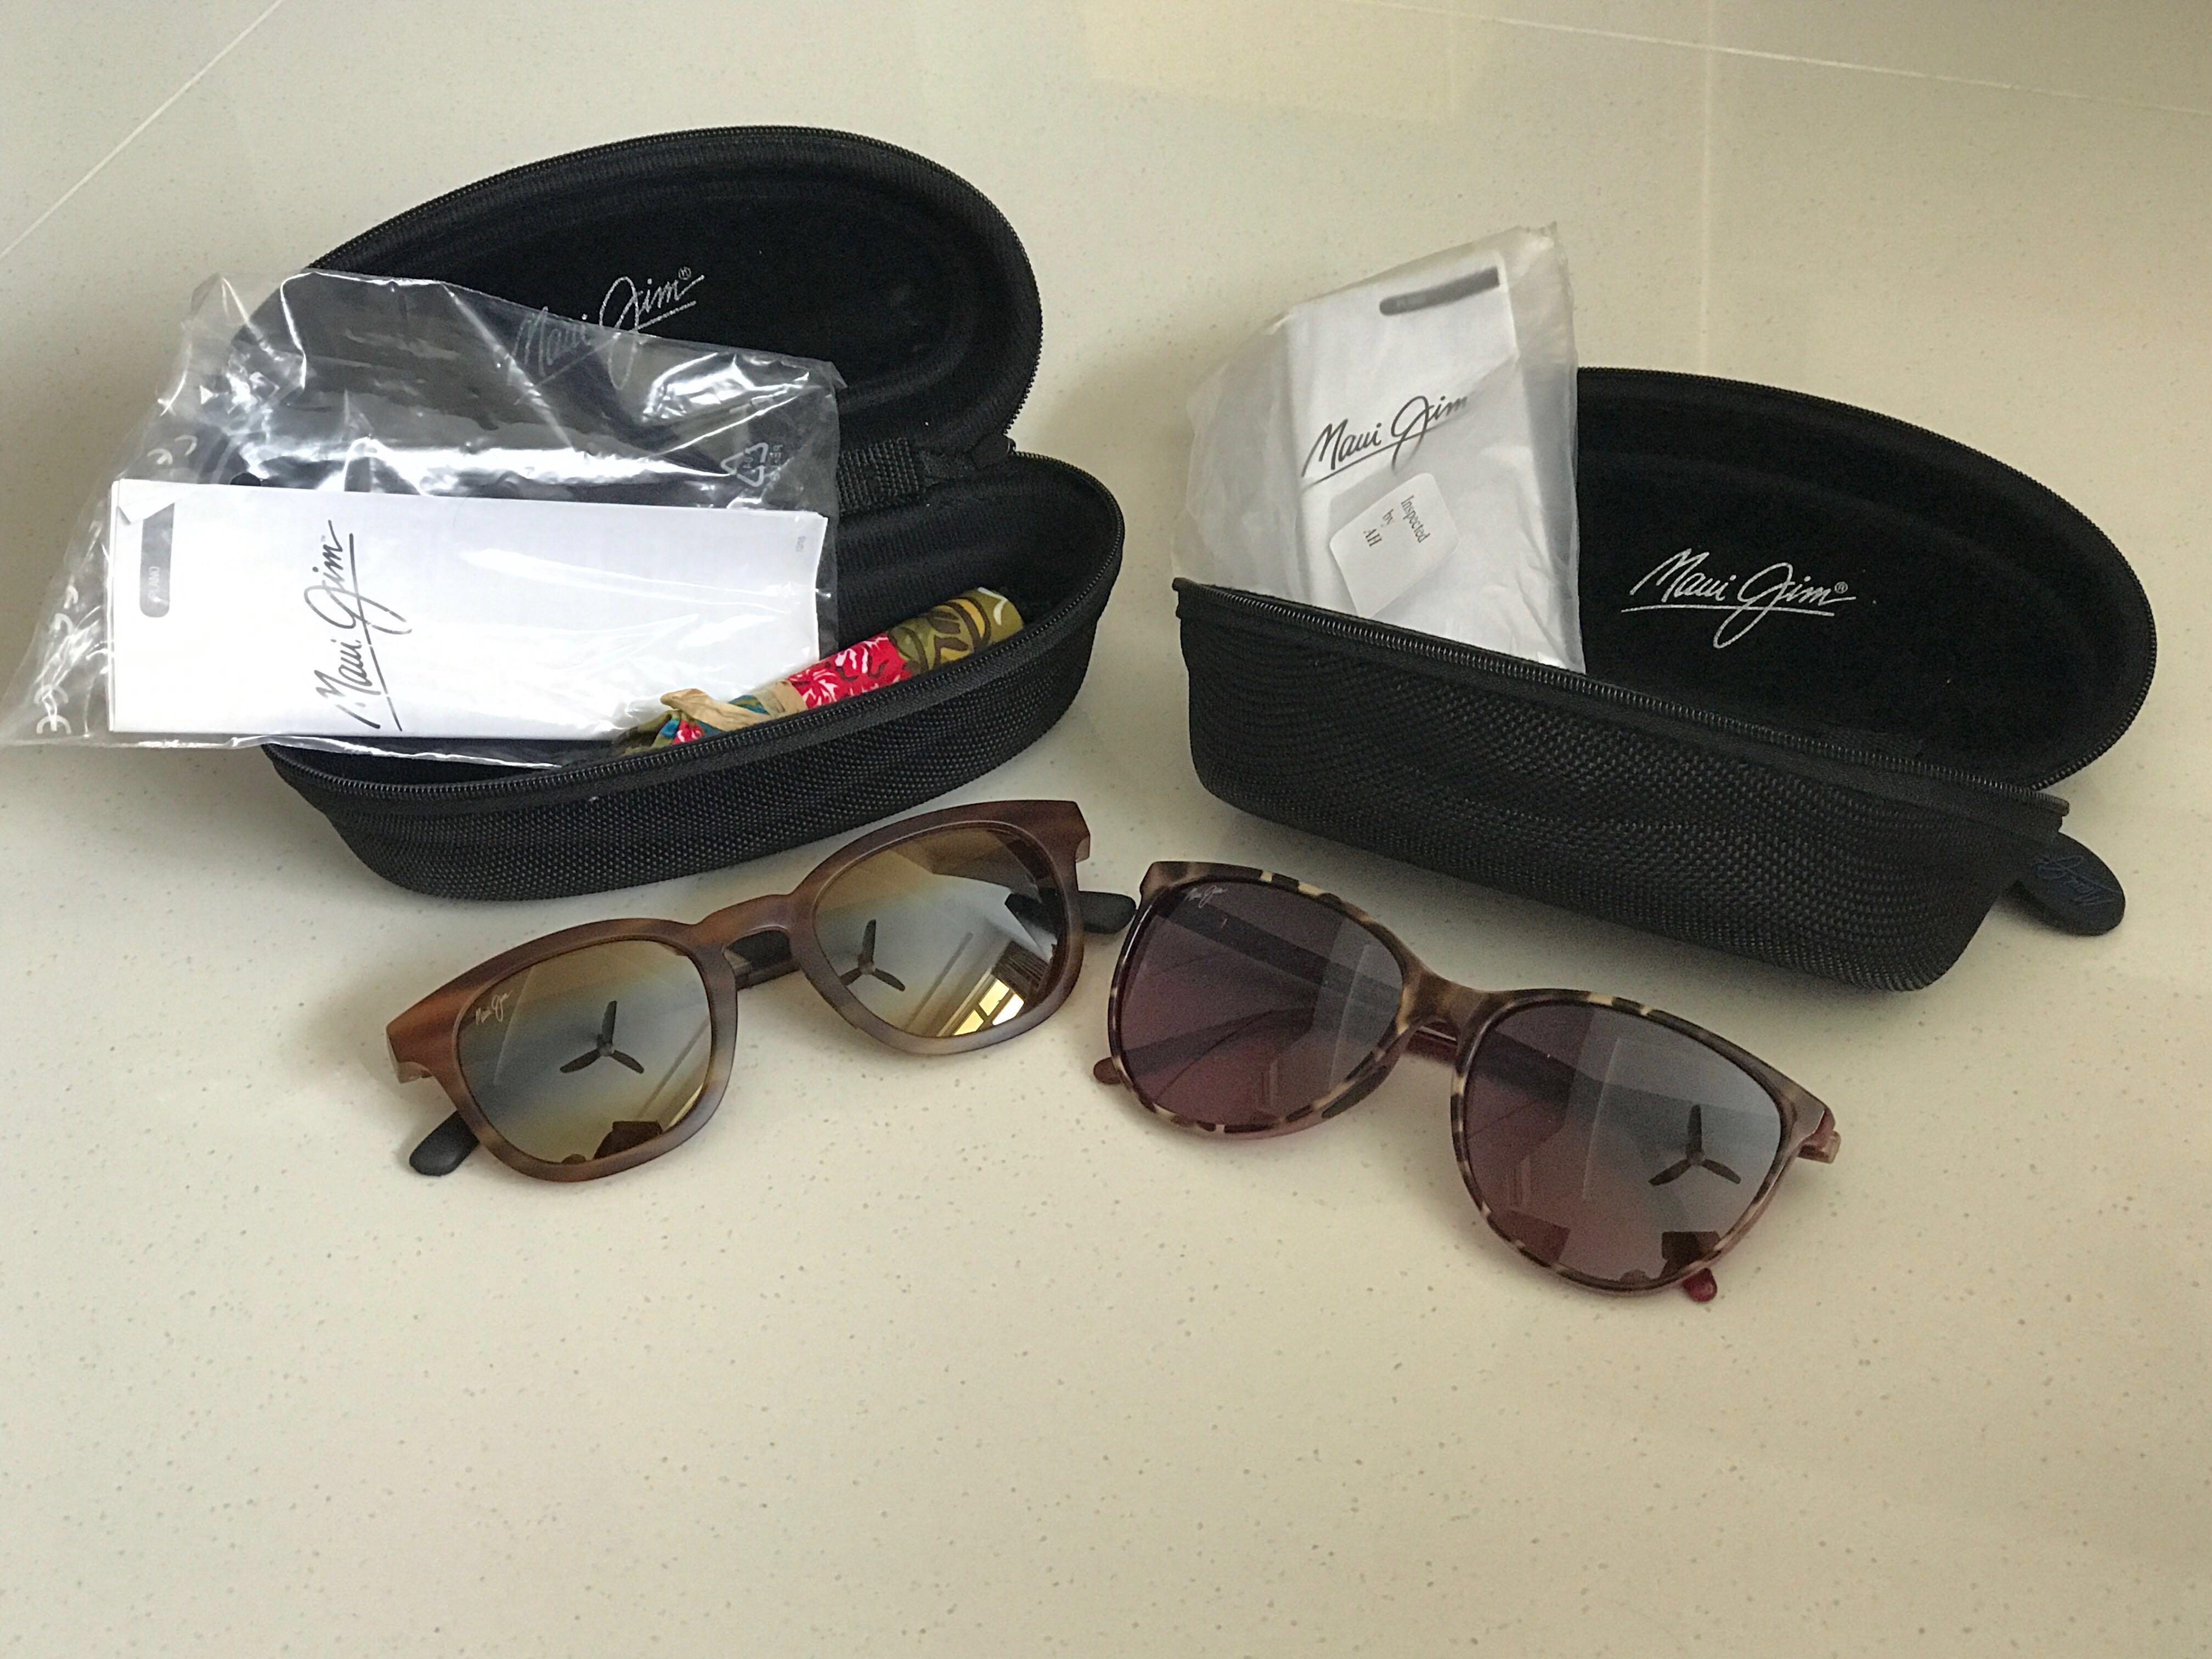 b788adeb26c8 Maui Jim sunglasses, Women's Fashion, Accessories, Eyewear ...